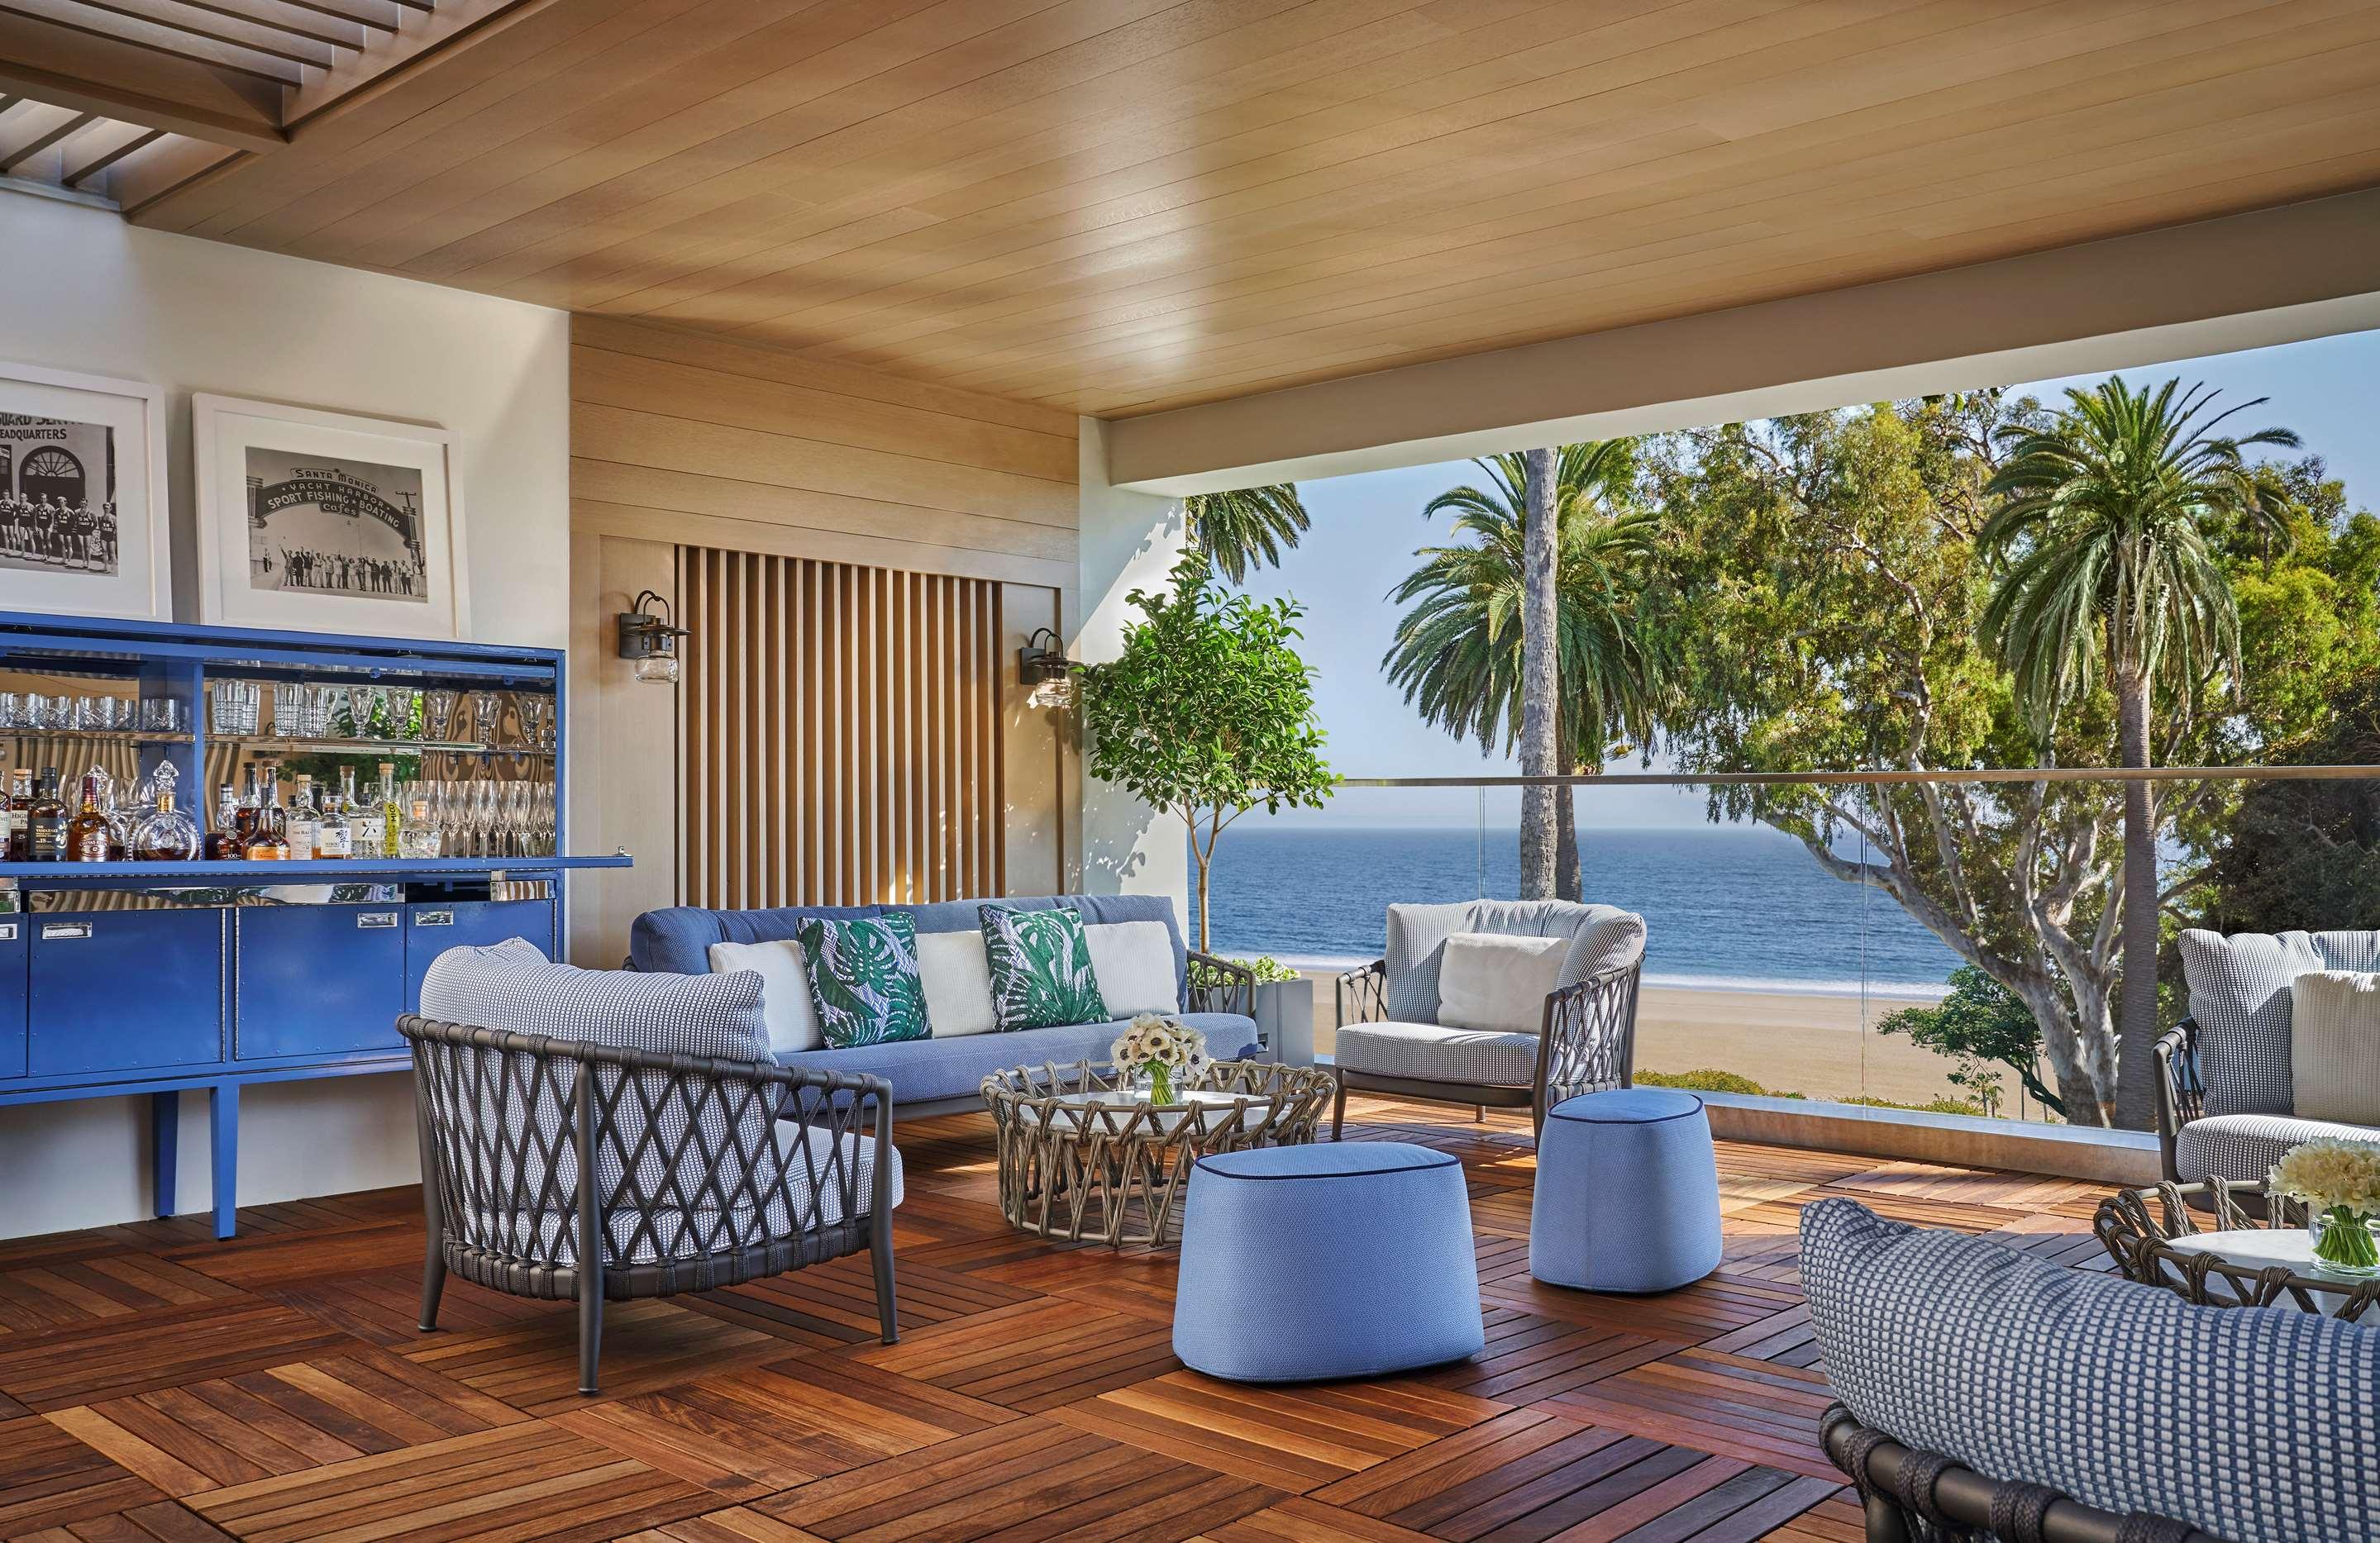 Ocean views from a seating area at Oceana Santa Monica.